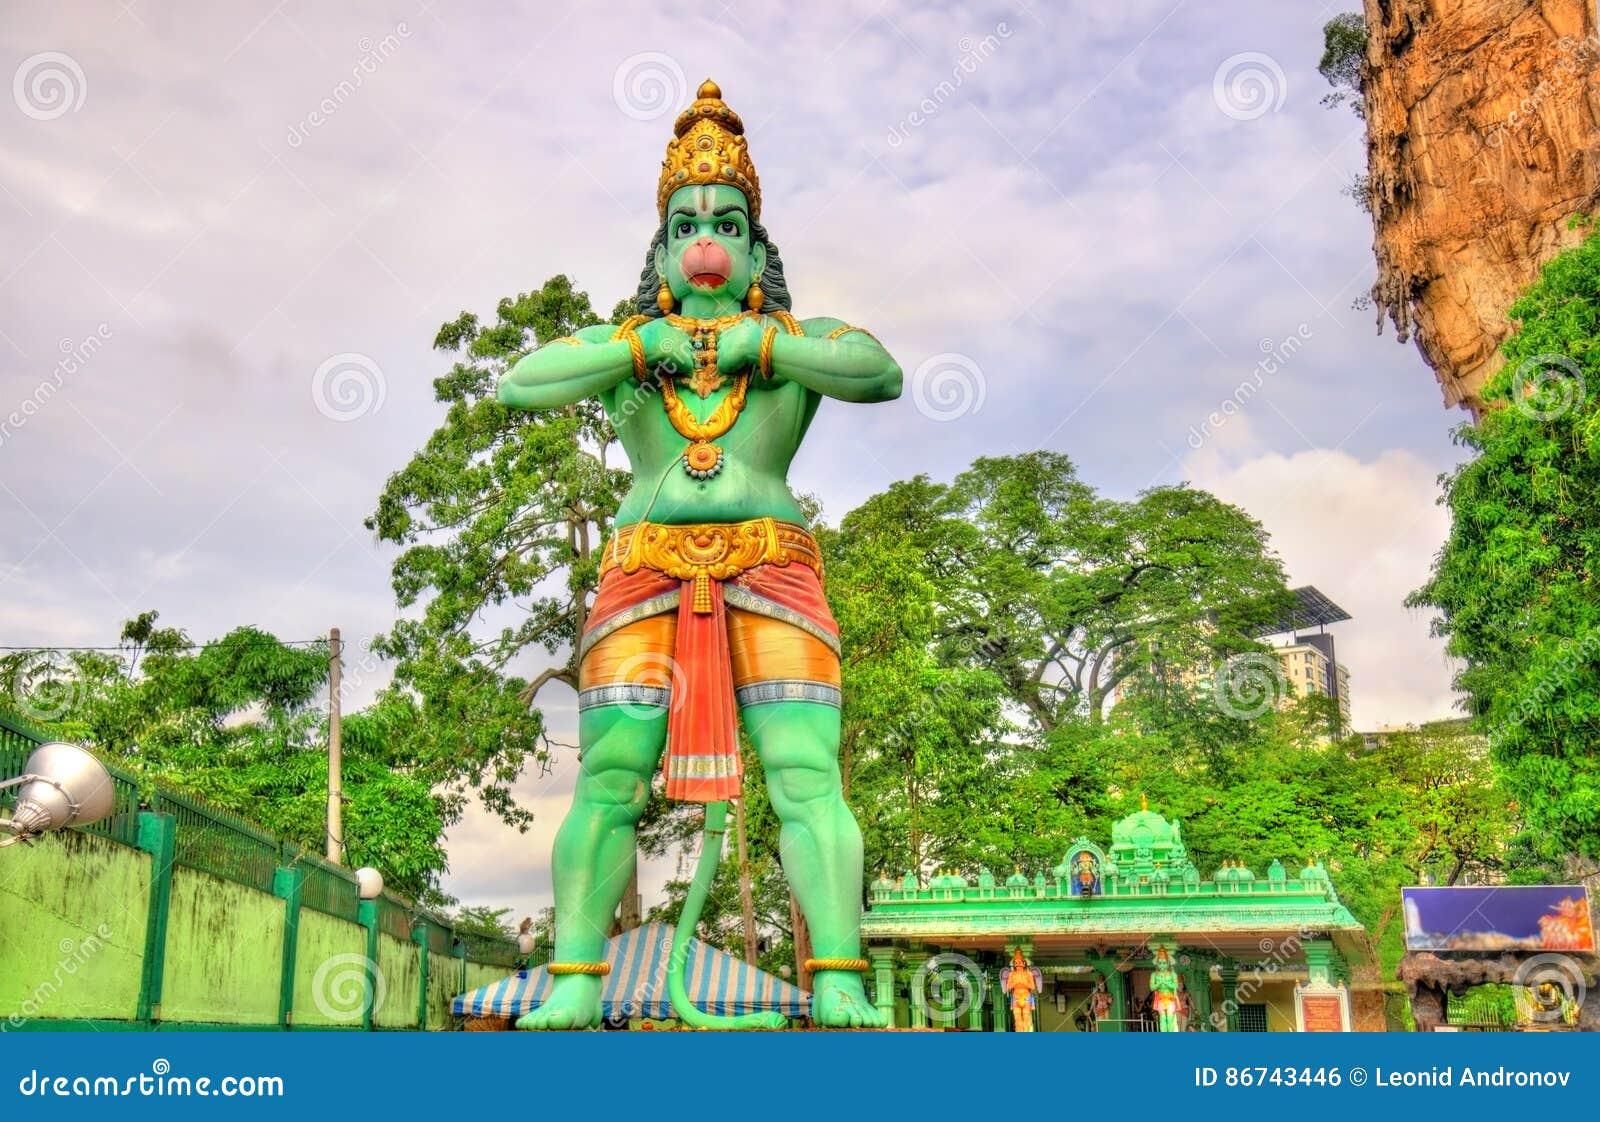 Staty av Hanuman, en hinduisk gud, på den Ramayana grottan, Batu grottor, Kuala Lumpur